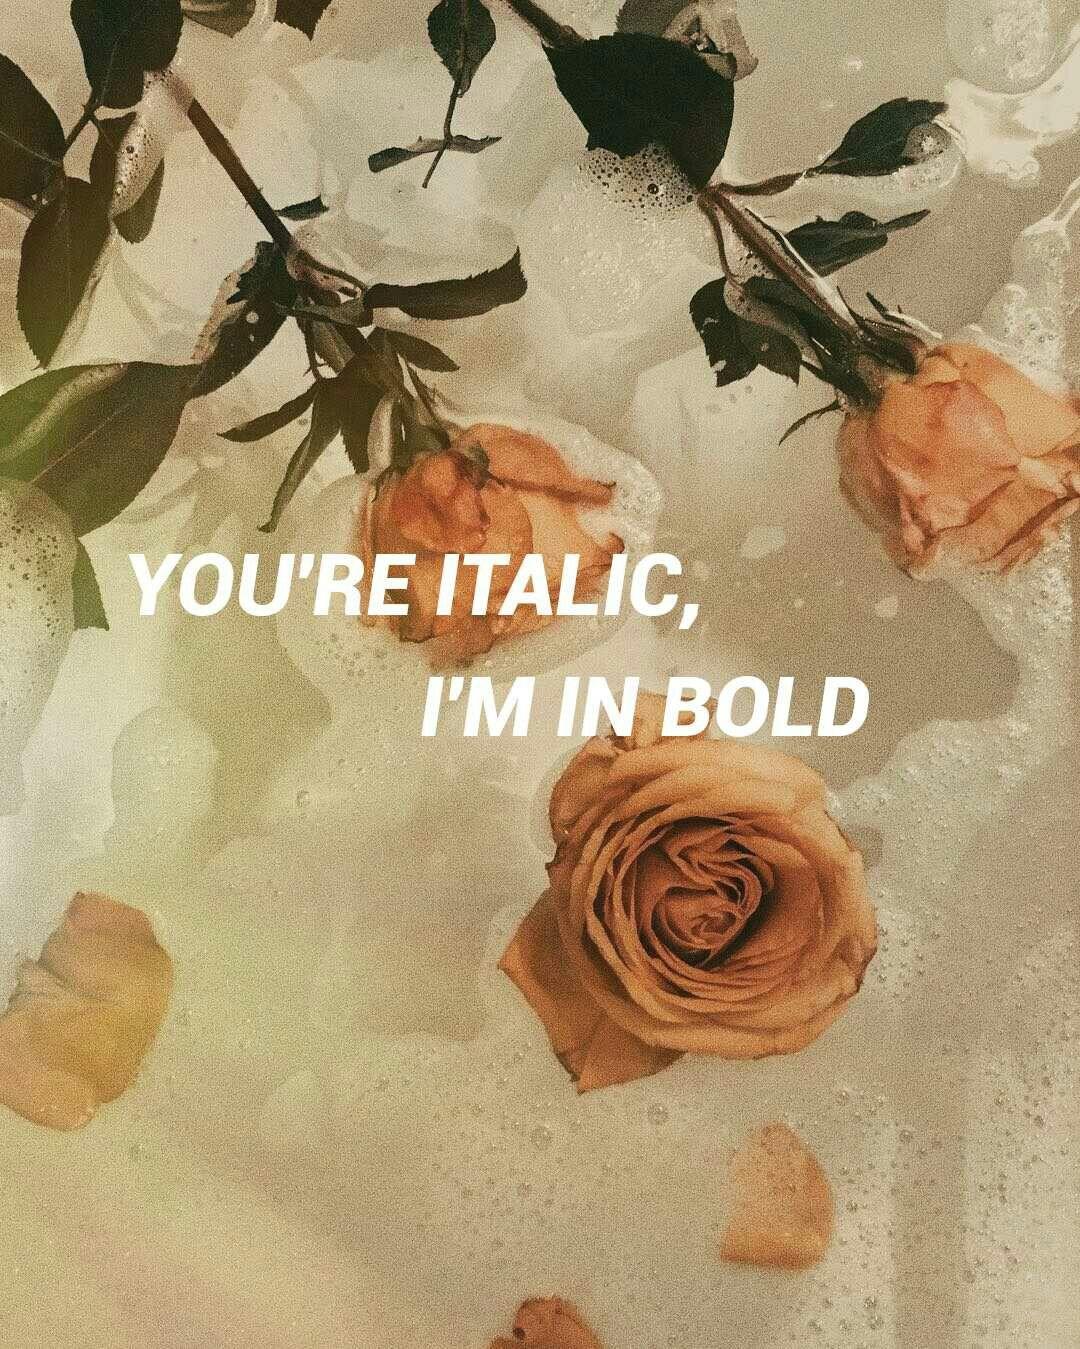 billie eilish  copycat \/\/ lyrics  M u s i c  Pinterest  Copycat